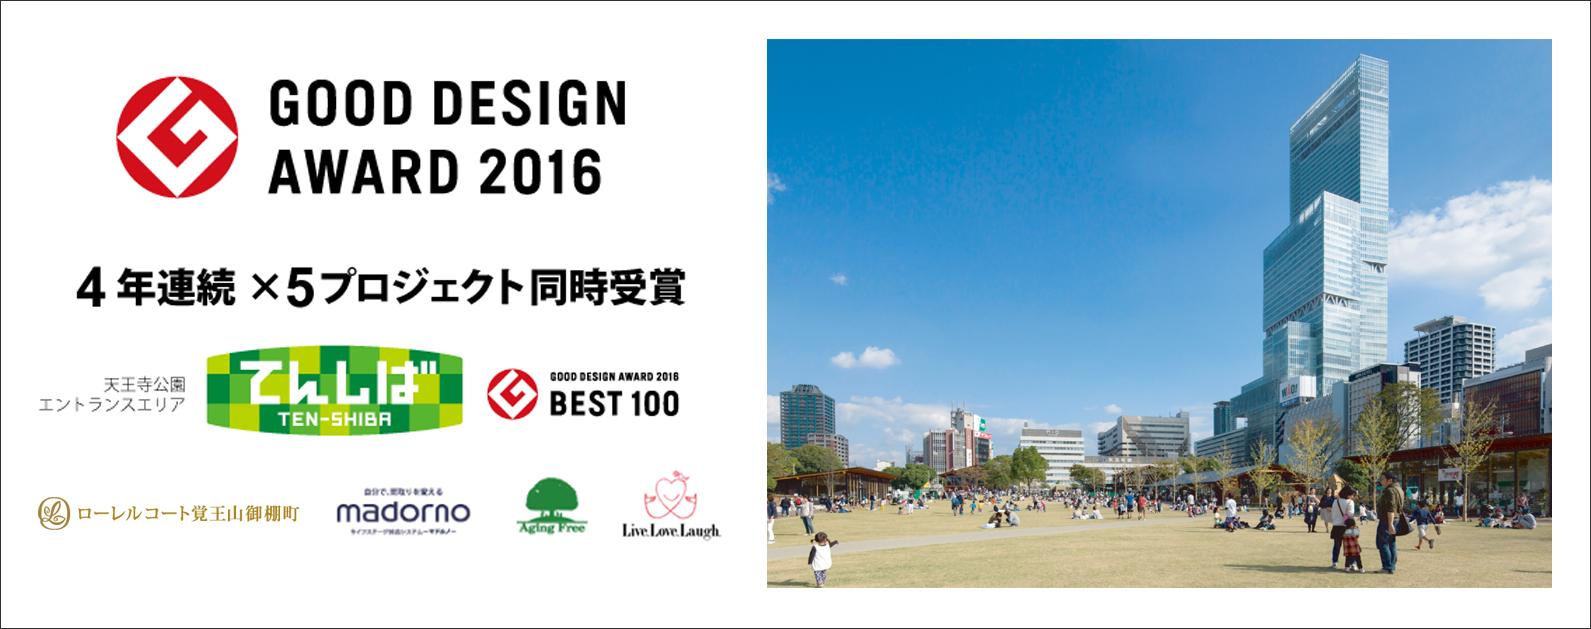 GOOD DESIGN AWARD 2016 4年連続×5プロジェクト同時受賞